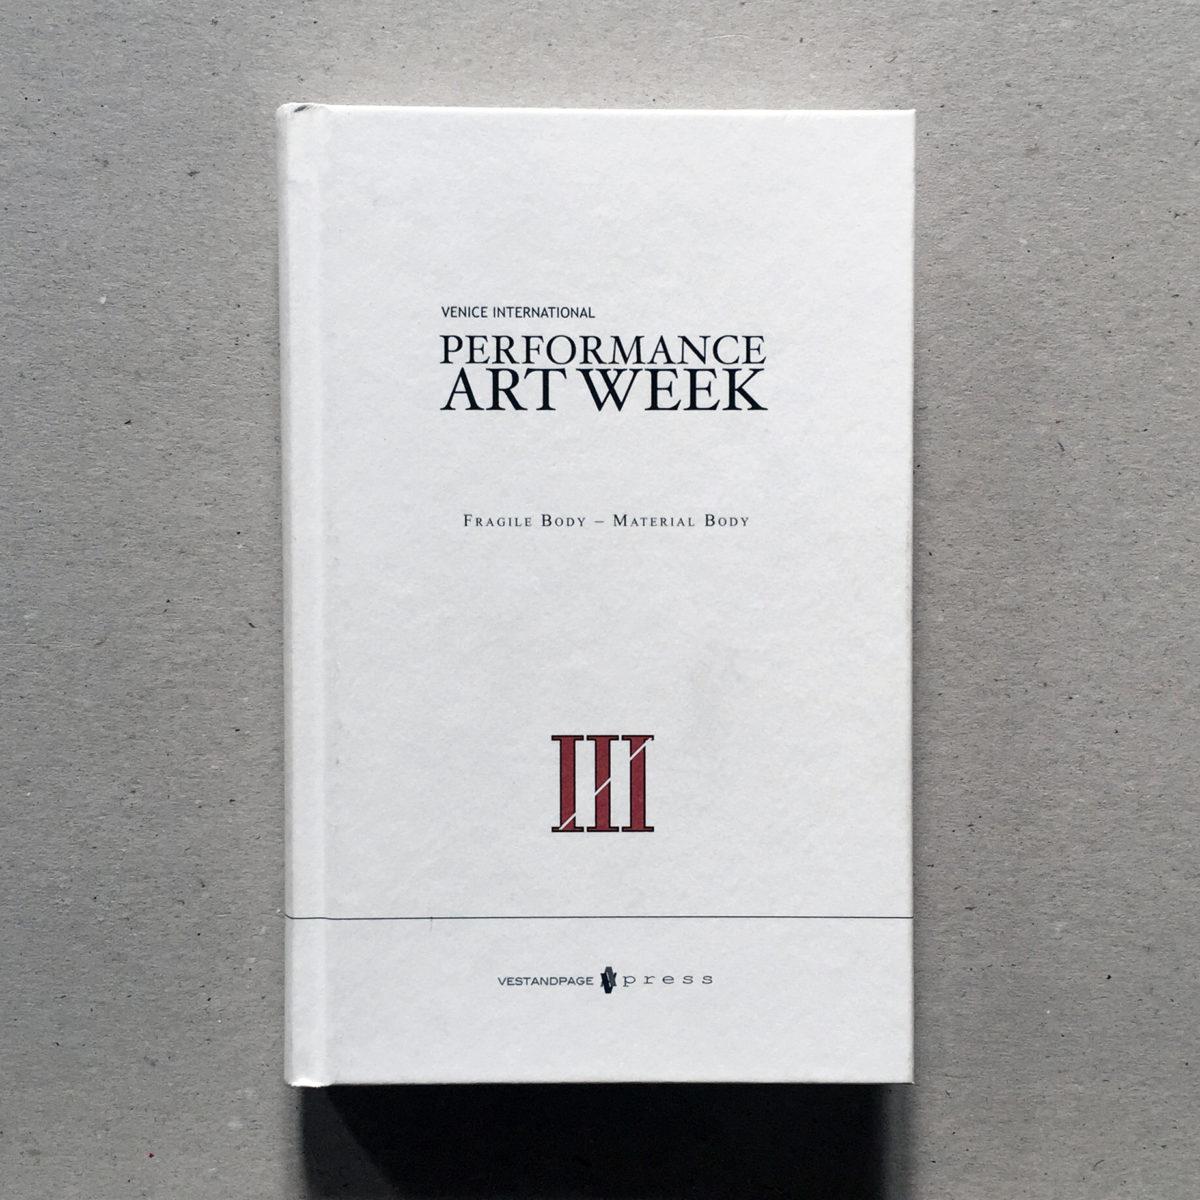 Venice Intl Performance Art Week III